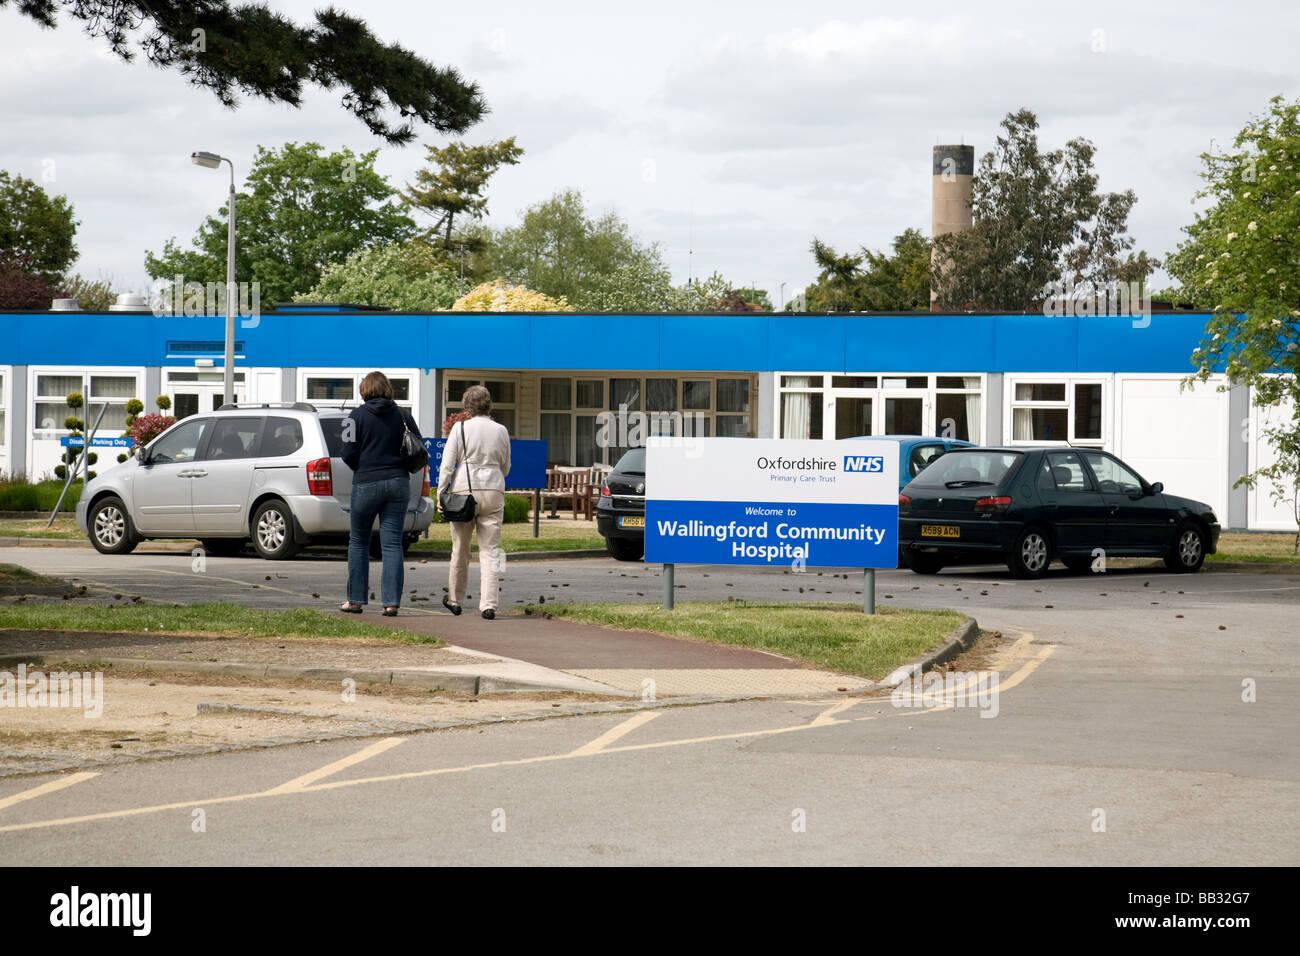 Visitors entering Wallingford Community Hospital, Wallingford, Oxfordshire, England - Stock Image